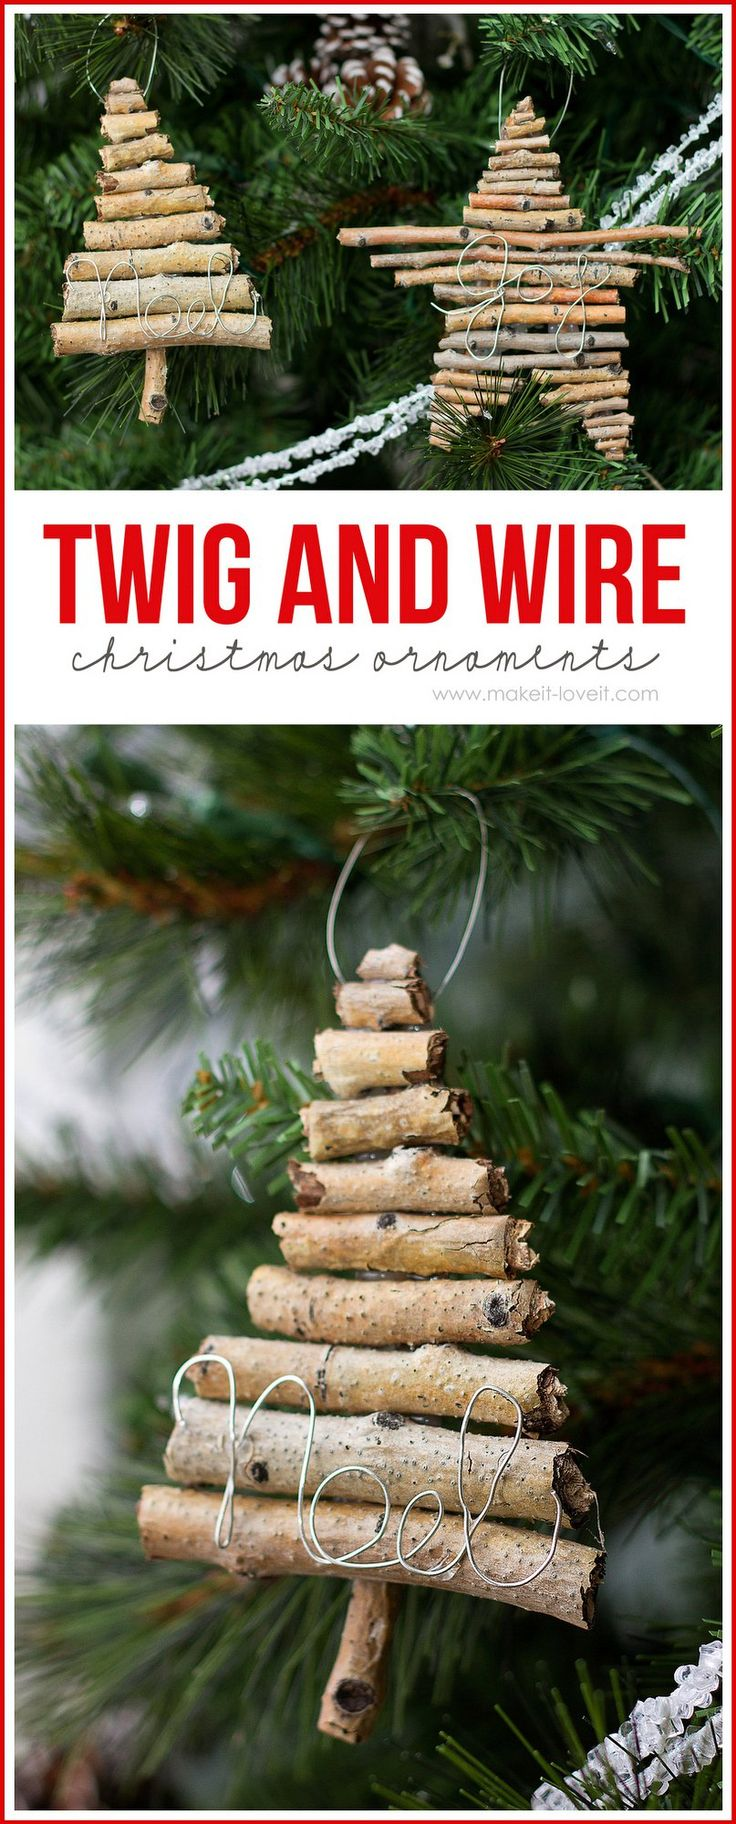 Homemade rustic christmas ornaments - Diy Rustic Christmas Ornaments